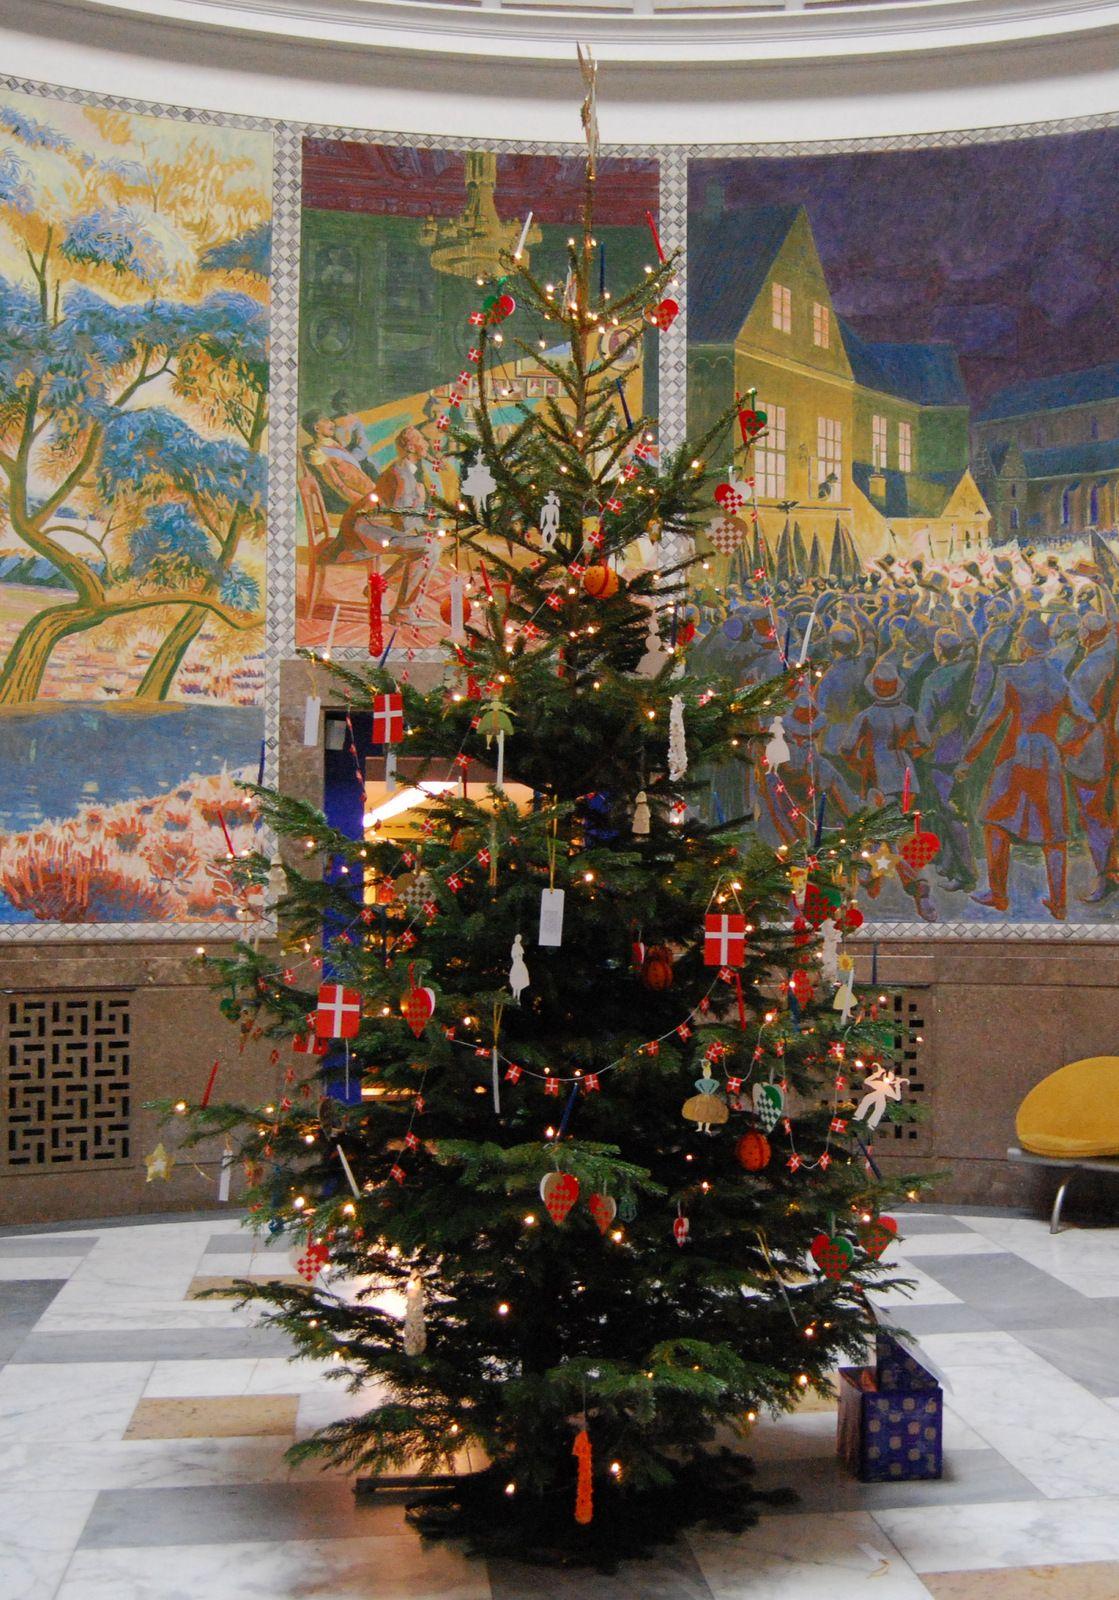 Christmas tree in H.C. Andersen's house, Odense 2007 Photo: Lars Bjørnsten